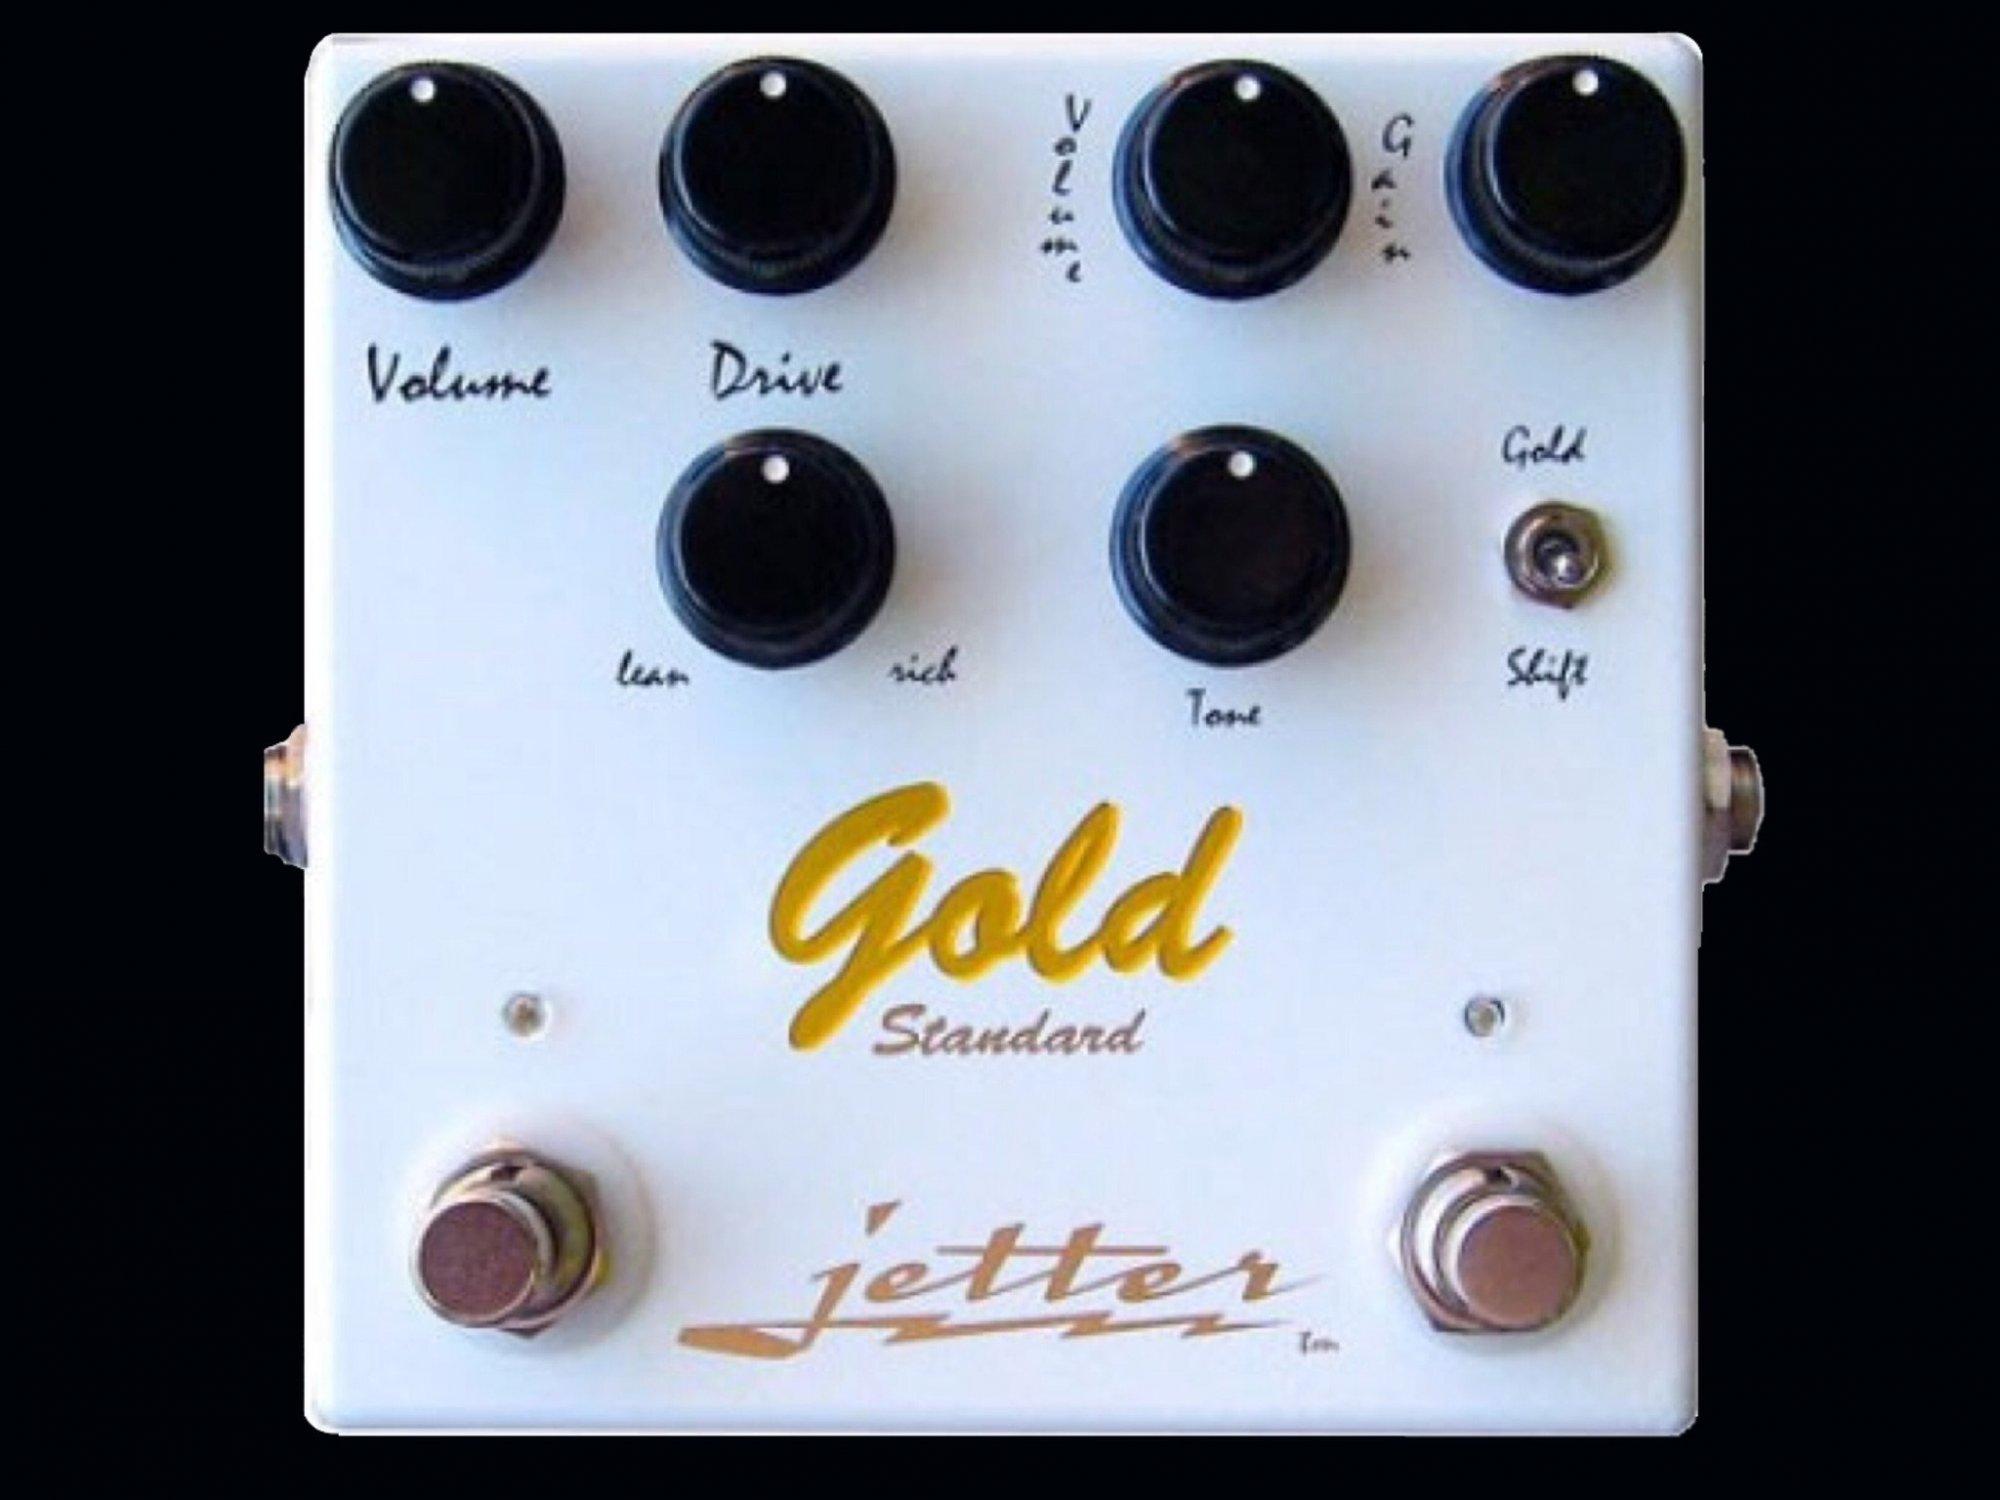 Jetter Gold Standard Pedal